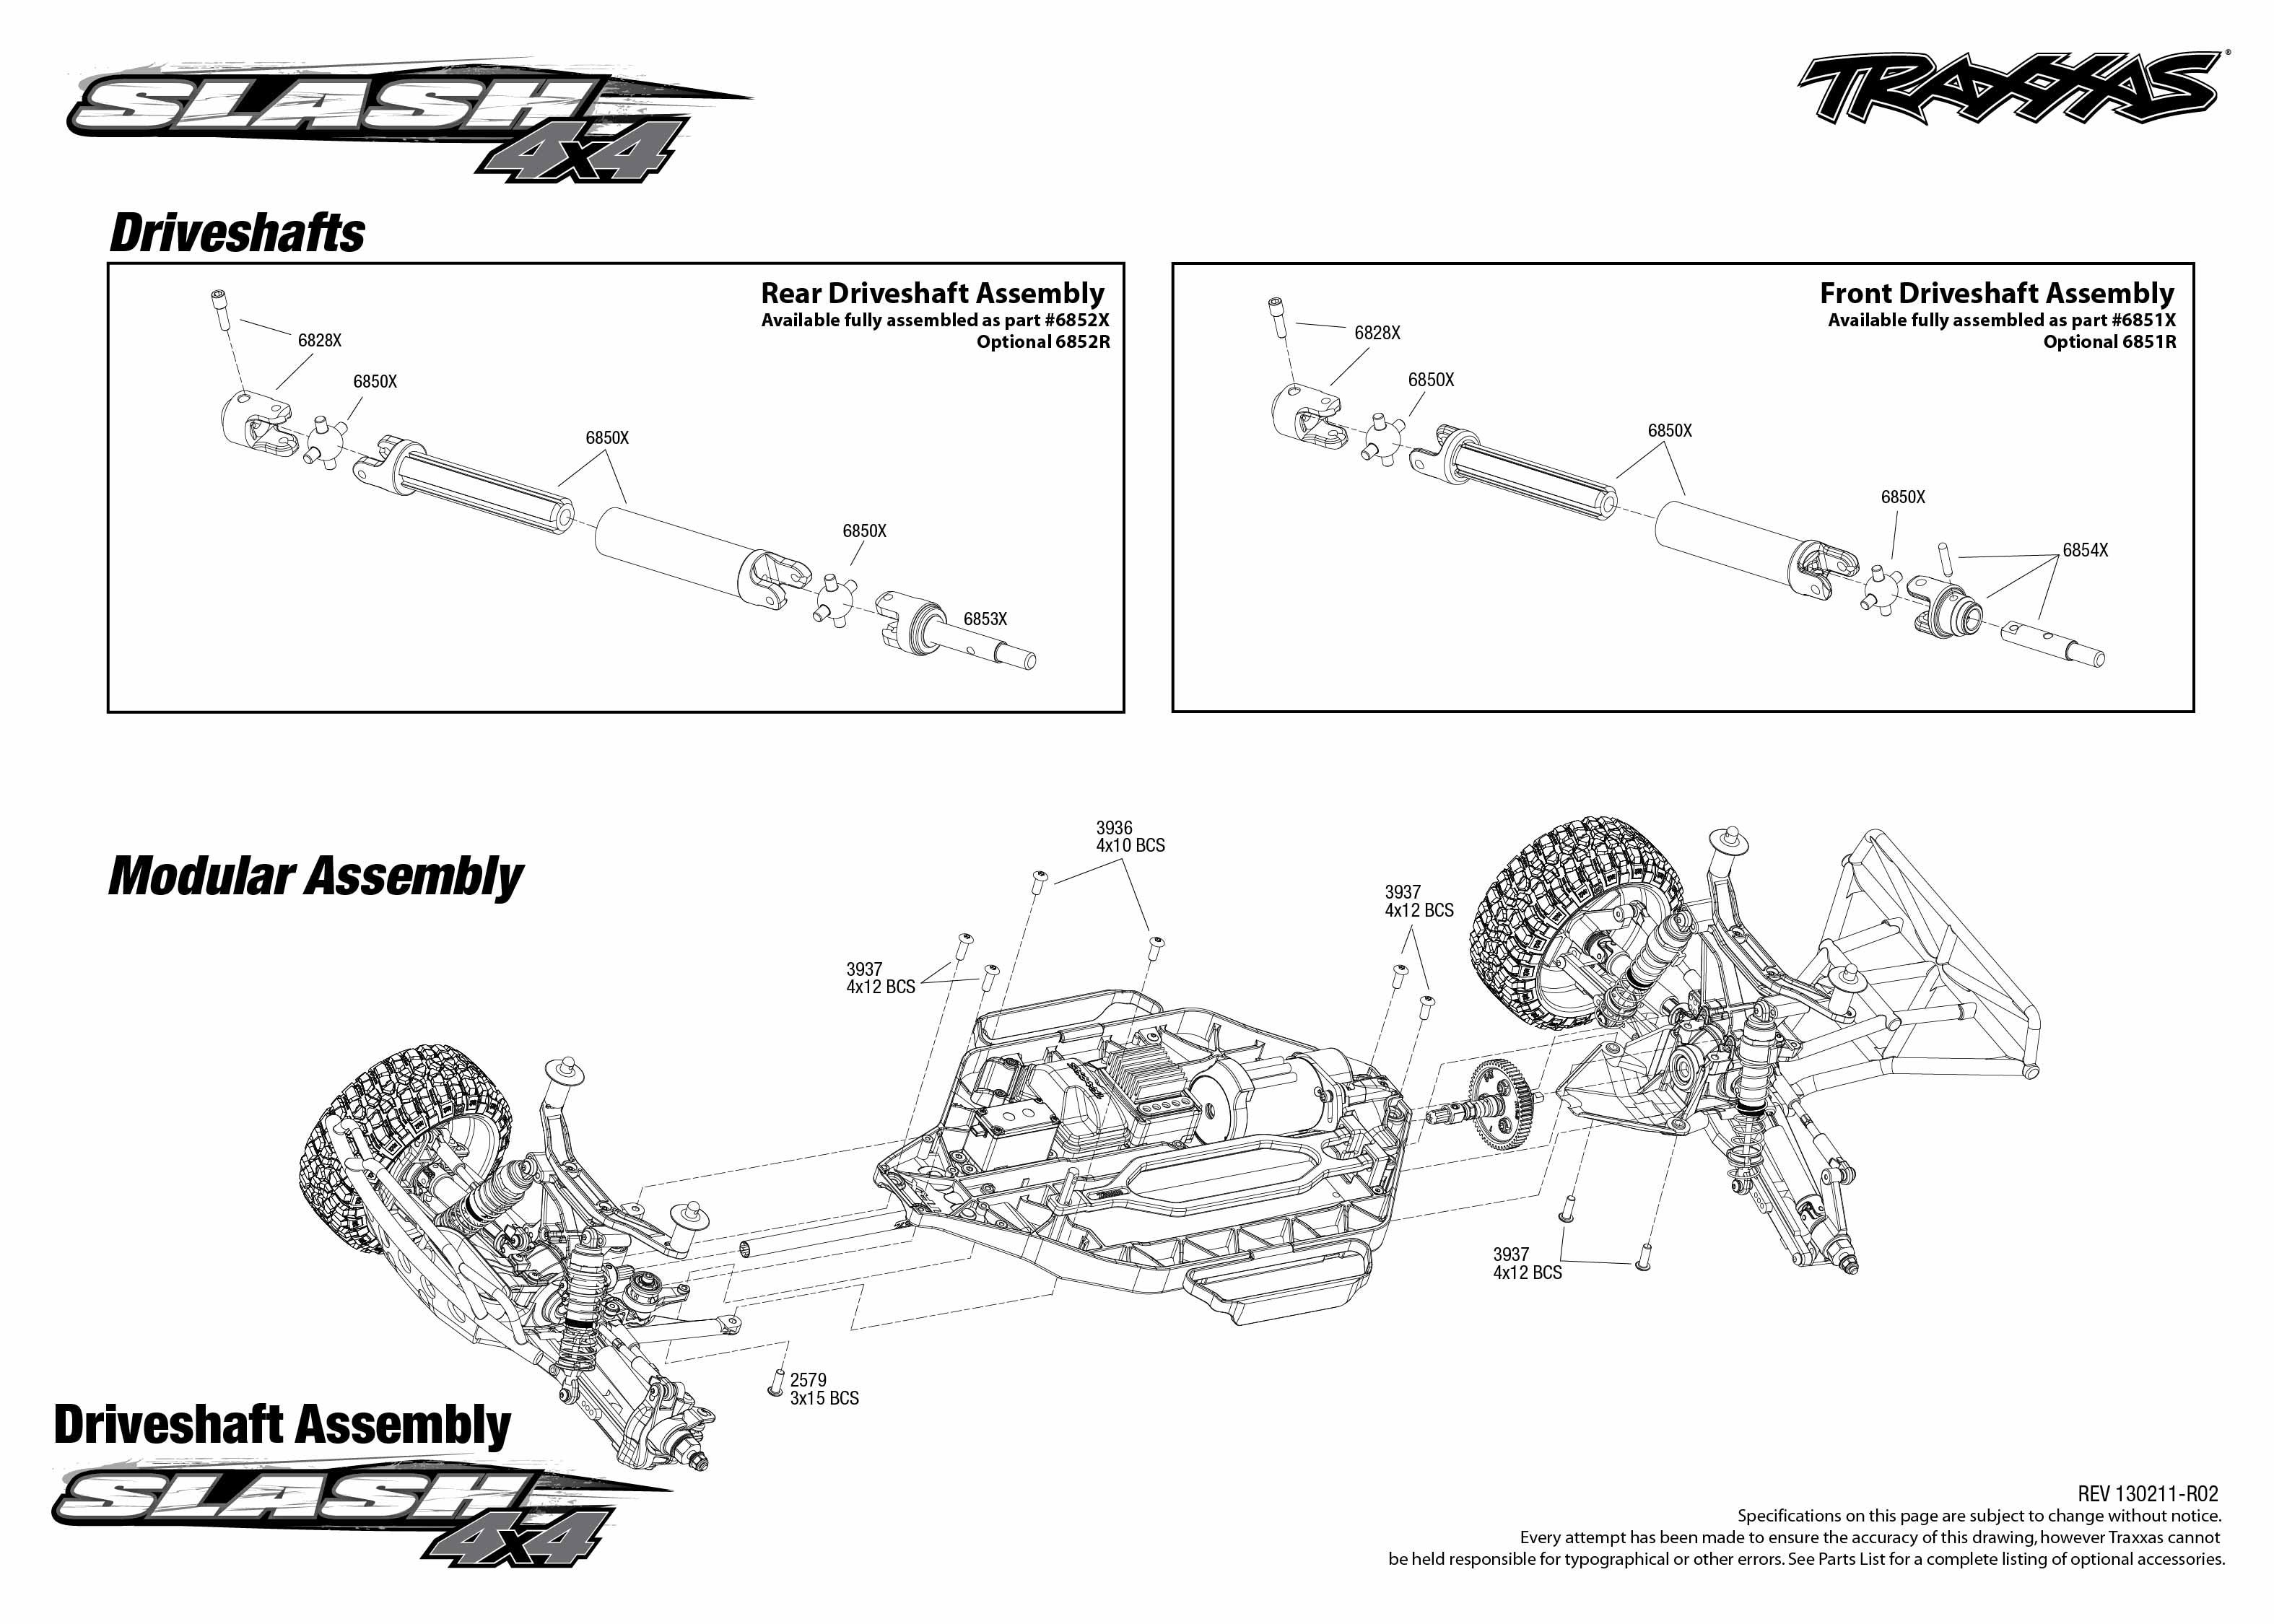 e revo brushless parts diagram club car golf cart battery wiring traxxas 1/10 scale slash 4x4 short course truck - 6808l